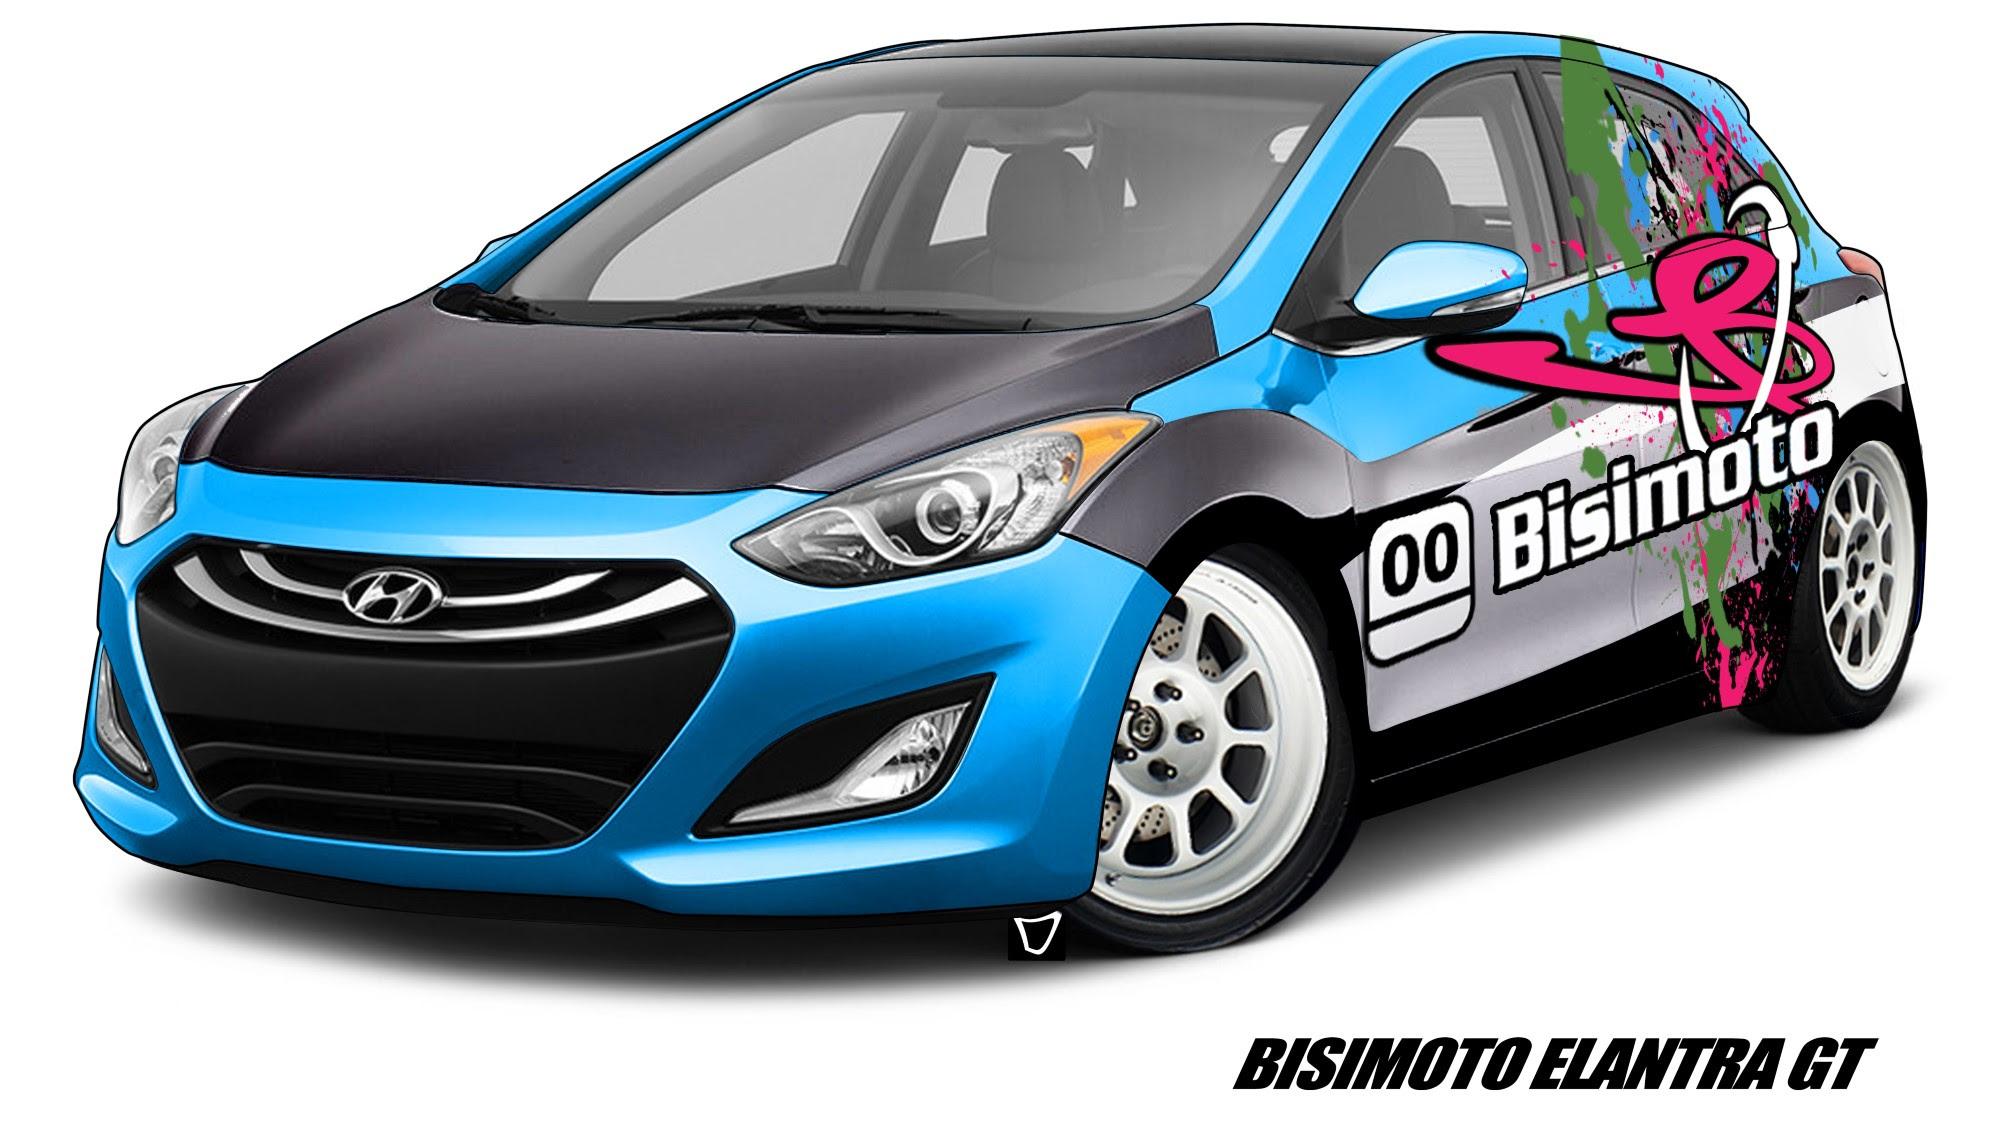 Bisimoto Hyundai Elantra GT Brings 600 HP To SEMA